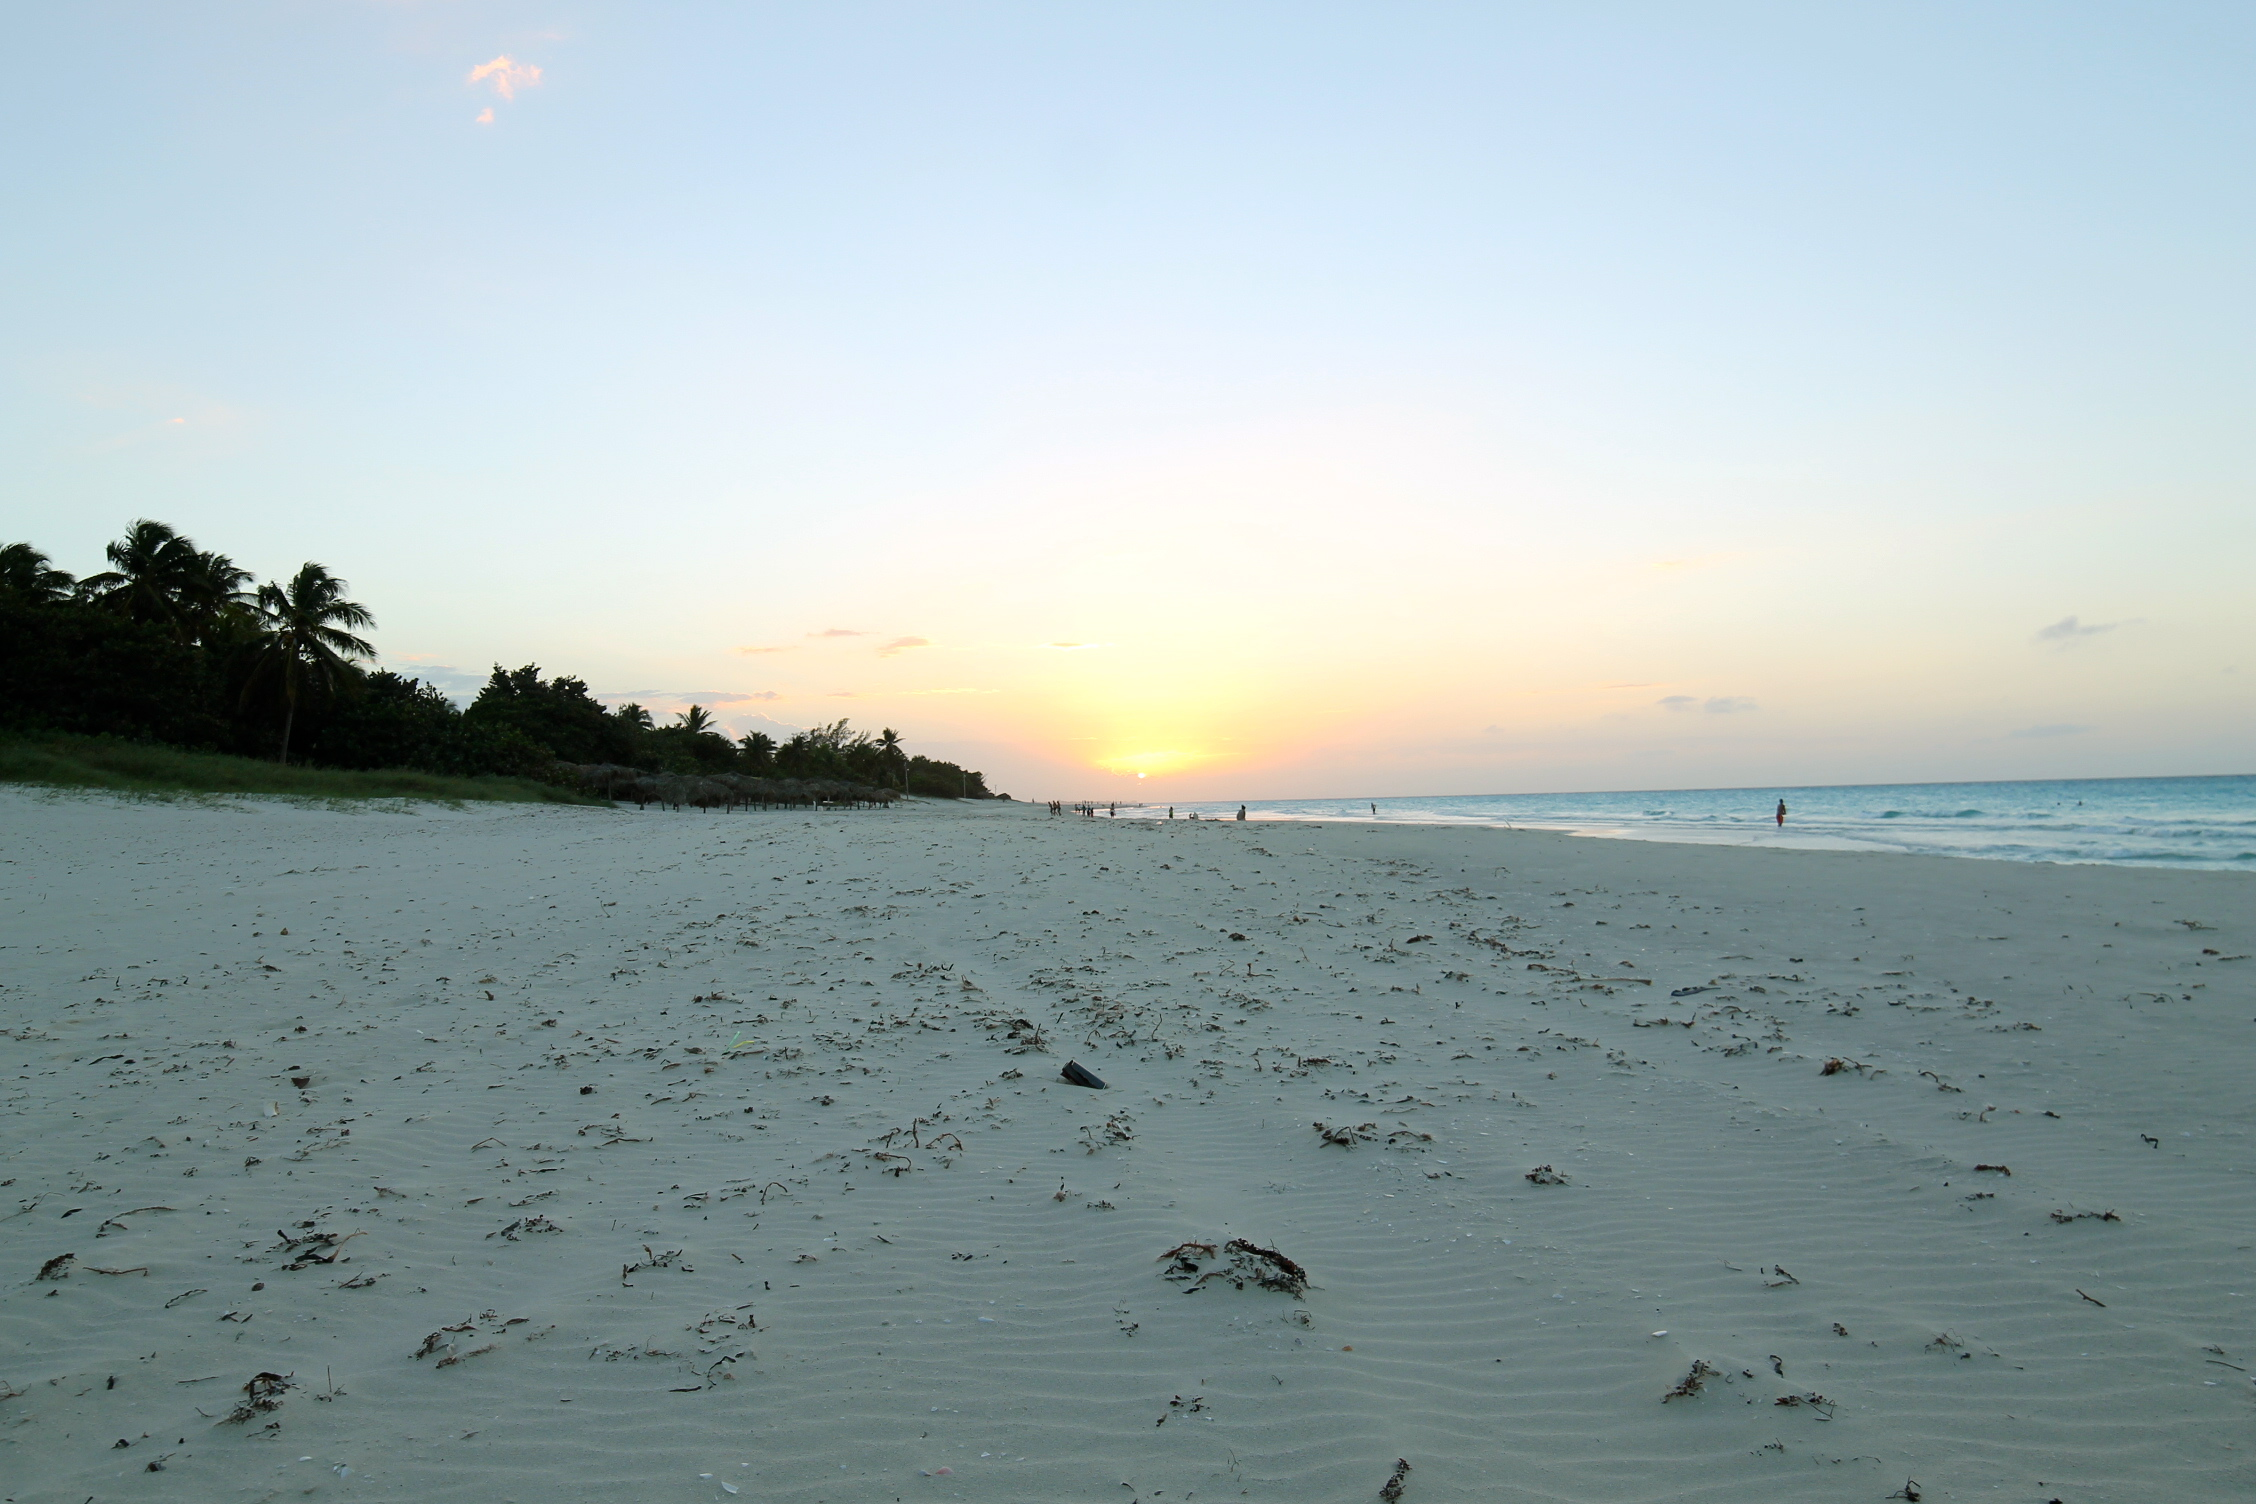 carnet d'image cuba varadero la plage